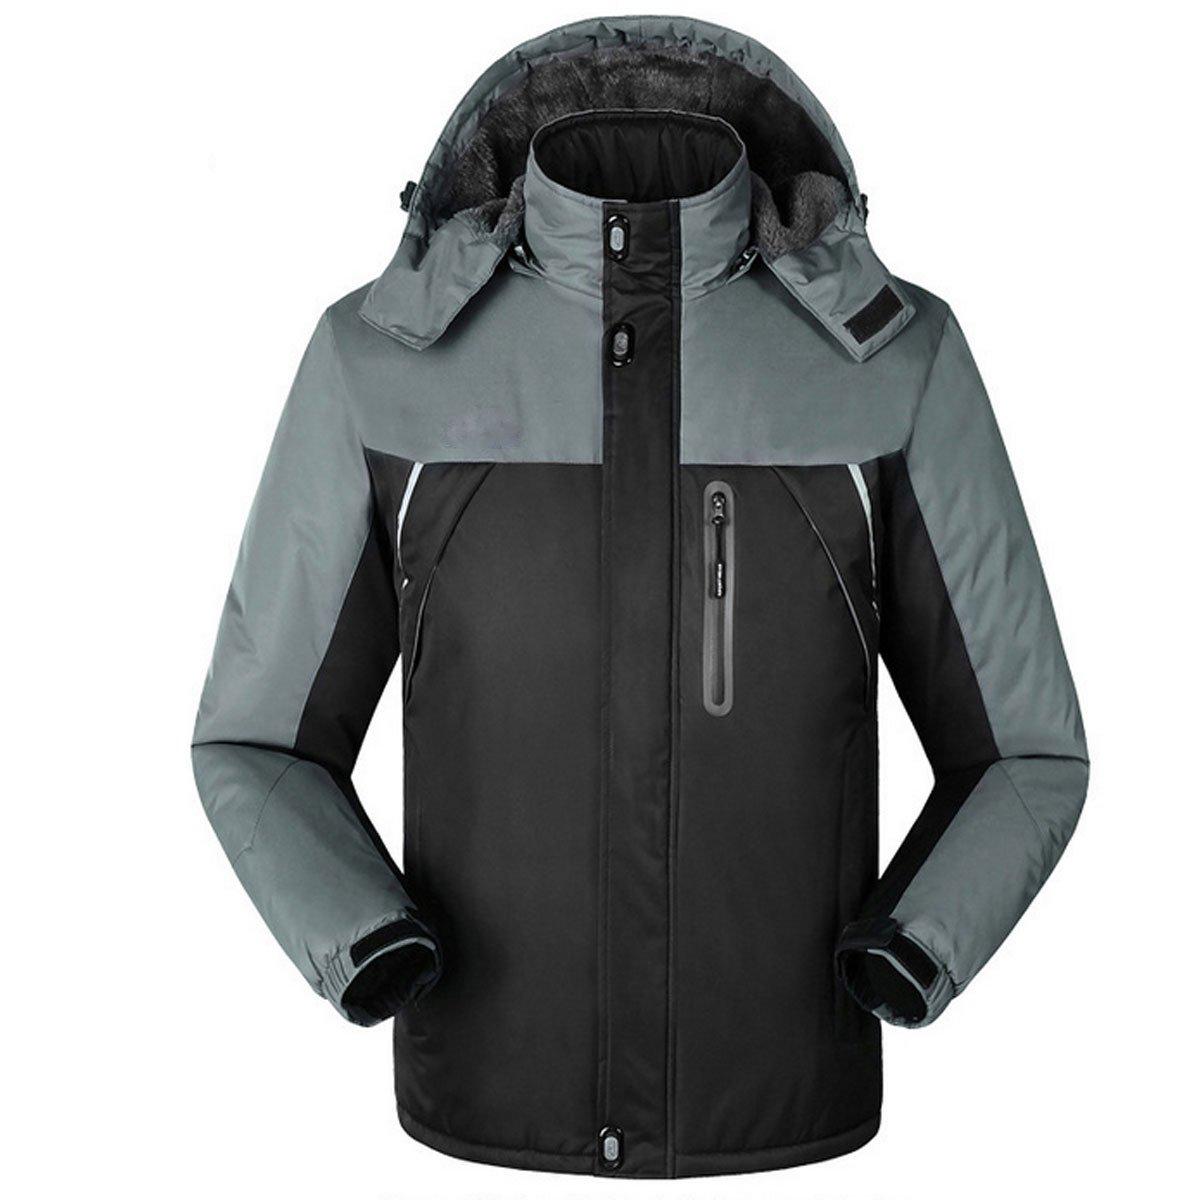 KSXXメンズ冬アウトドア防水性通気性フード付き登山ハイキングスノーボードスポーツジャケットコート B014FEC5JU XX-Large|ブラック ブラック XX-Large